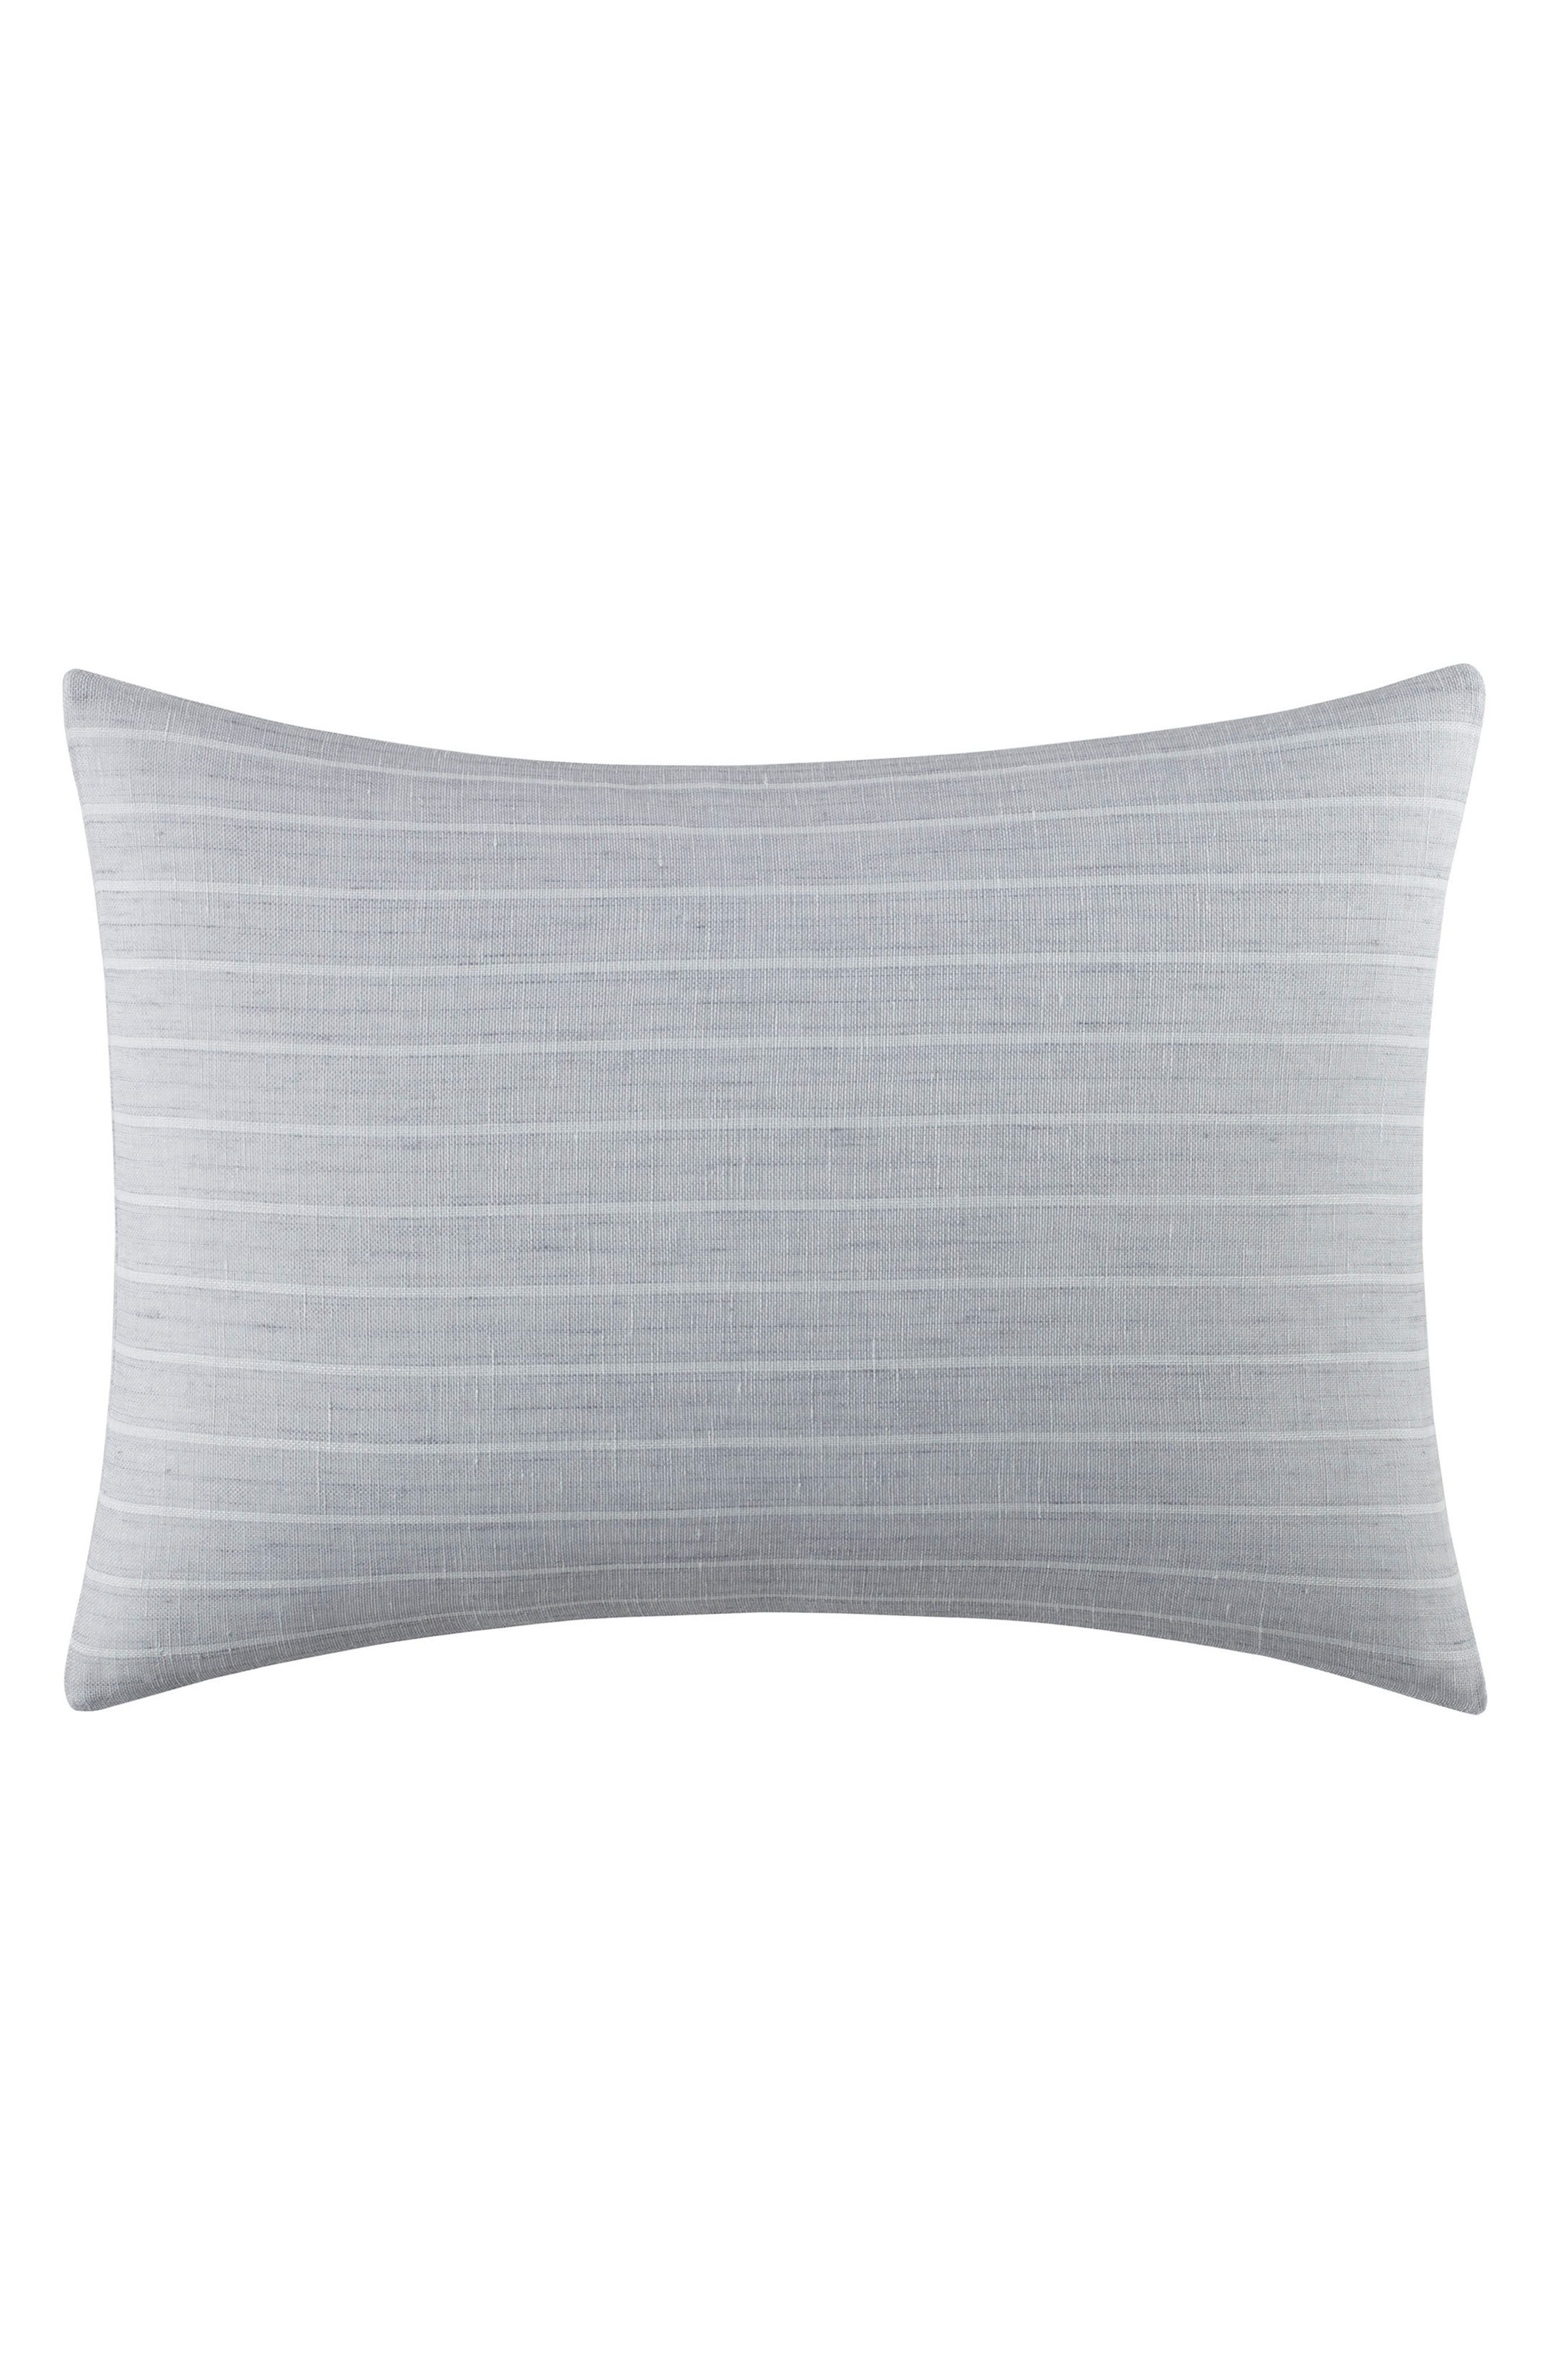 Veiled Bouquet Breakfast Accent Pillow,                         Main,                         color, 020